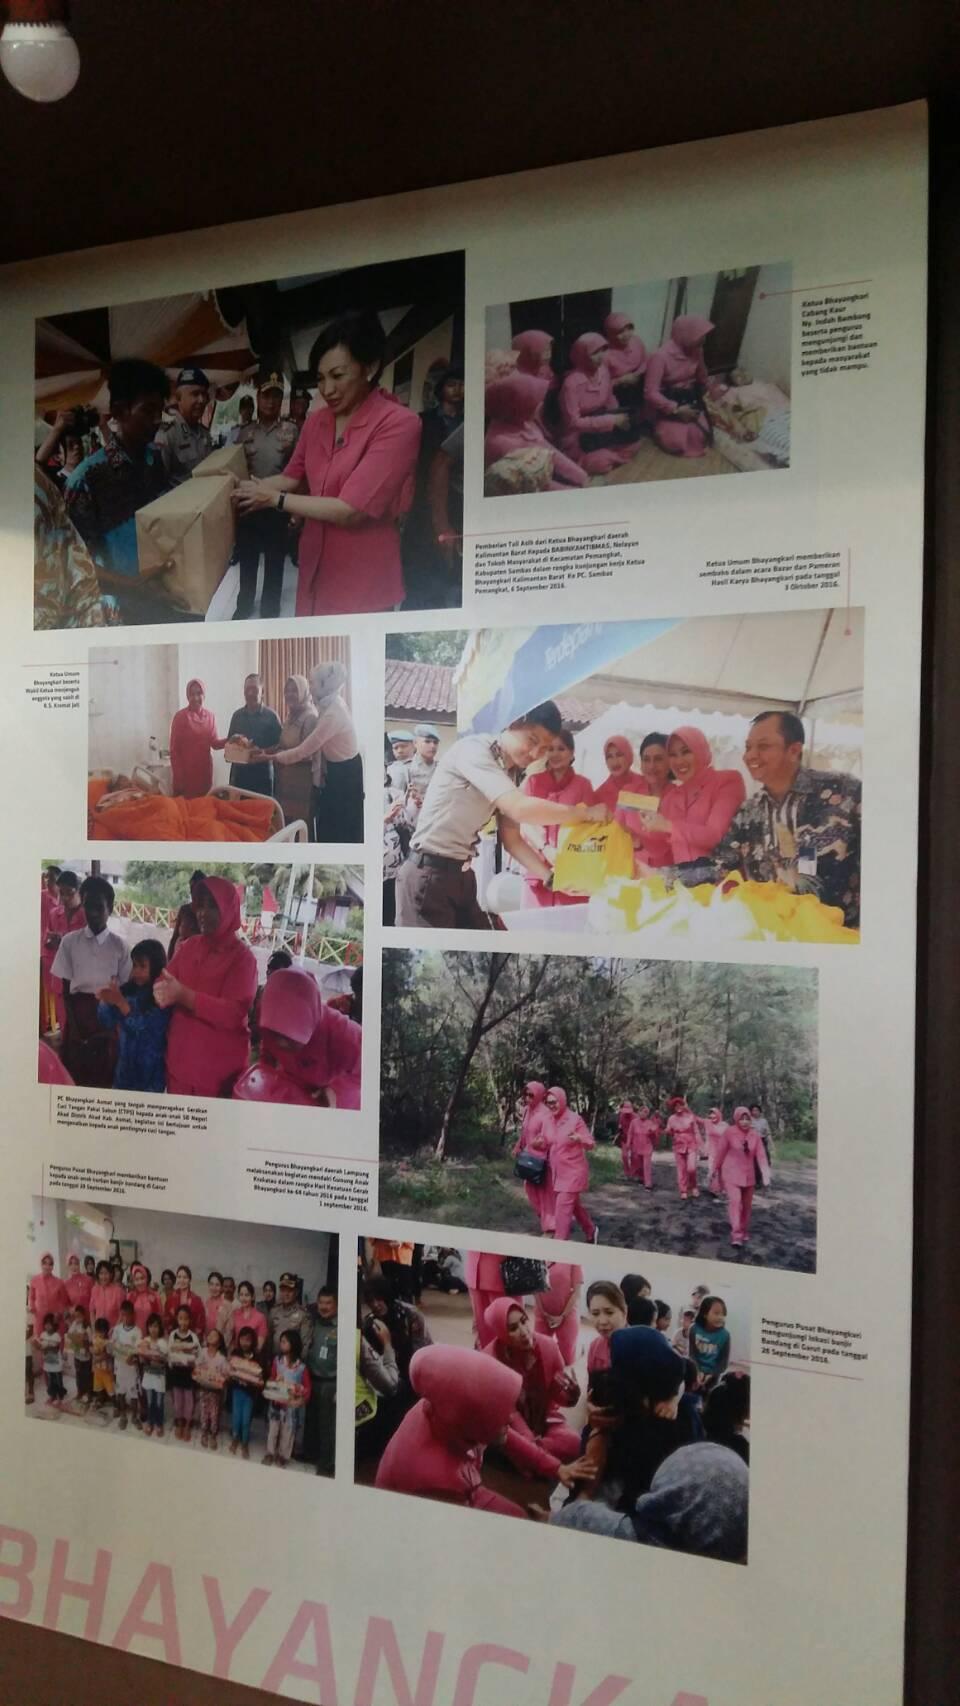 Labsky11mipa5 Xi Mipa 5 Sma Labschool Kebayoran Organisasi Bhayangkari Museum